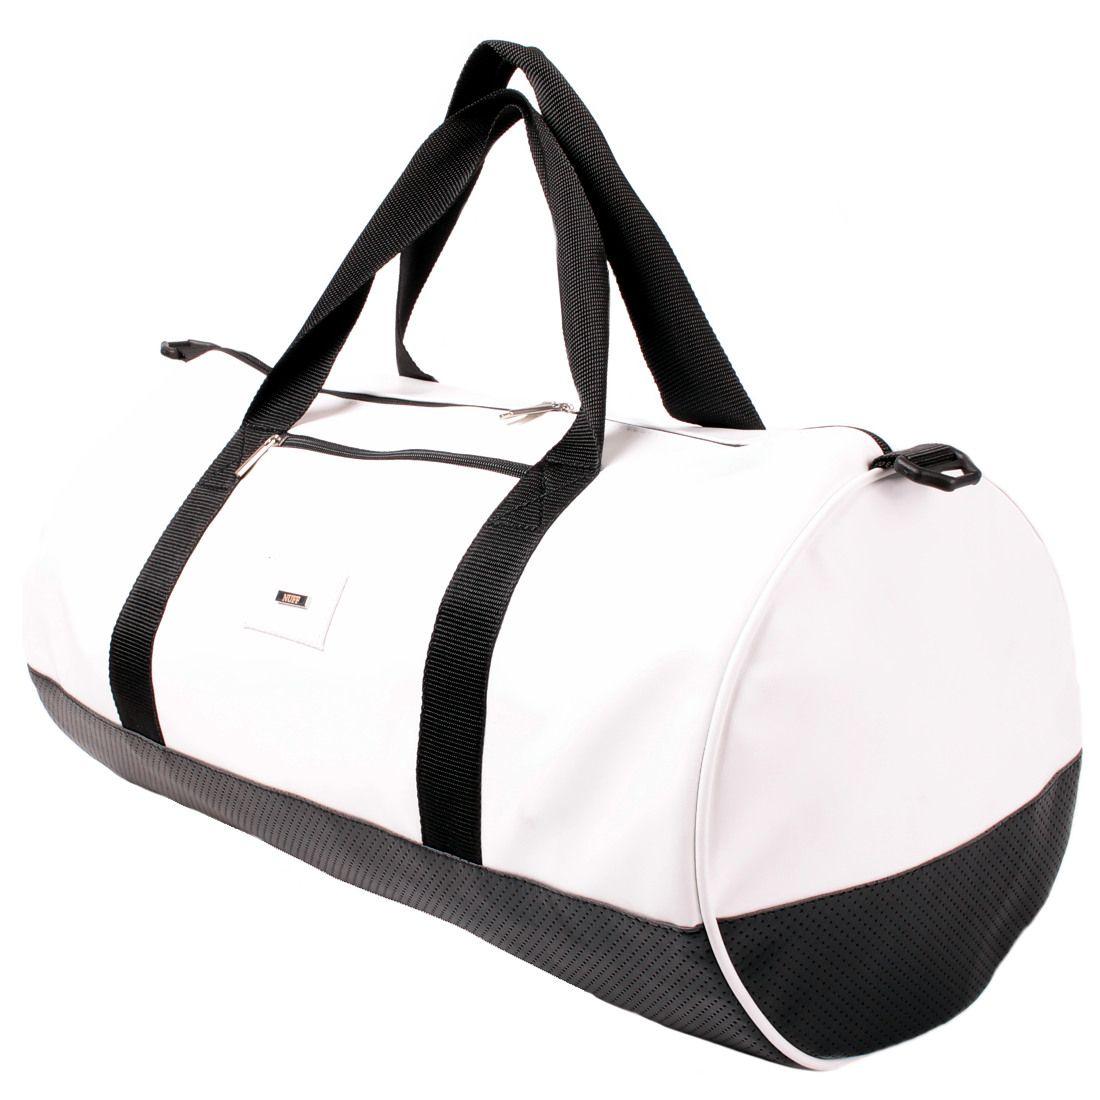 9843692b80e00 GALANTERIA » Torby i torebki » Torba podróżna Sport Nuff Duffel ...